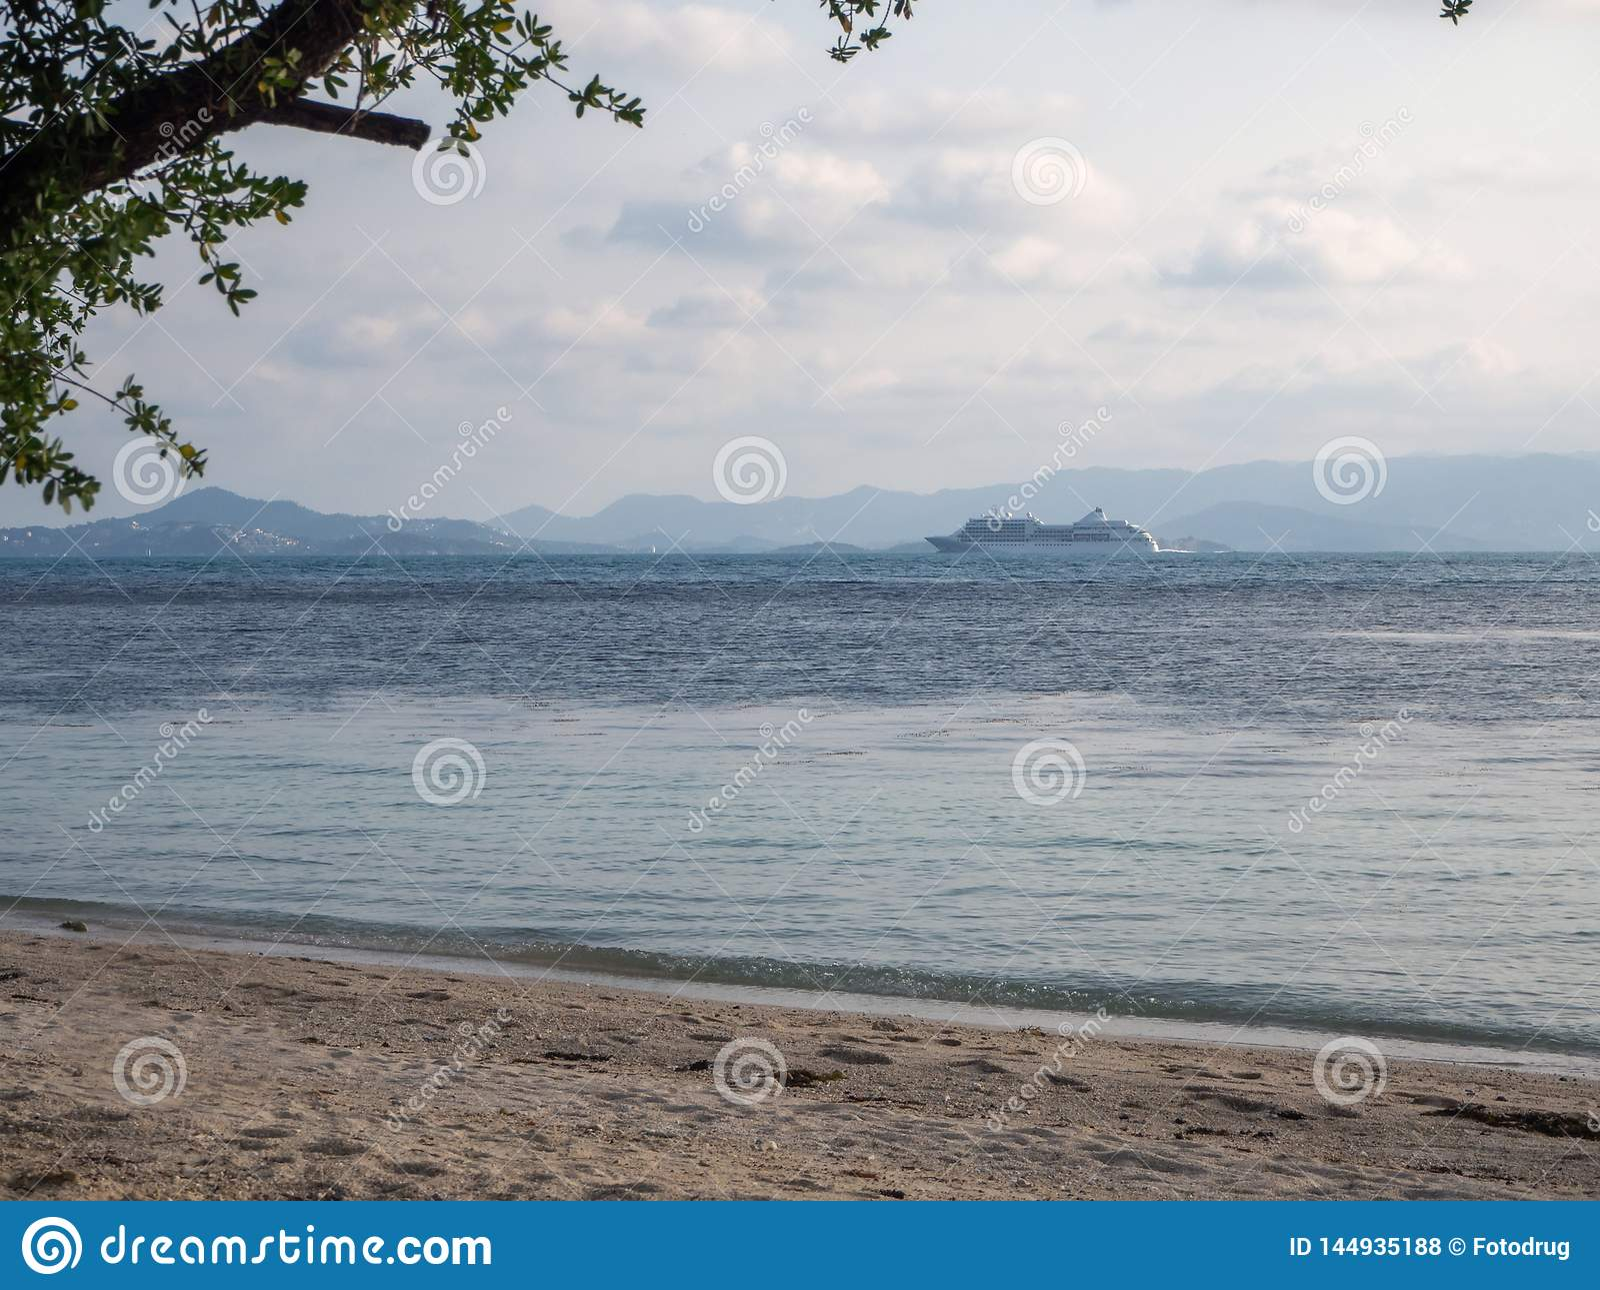 Balsa branca que flutua no mar de turquesa ? ilha com nuvens